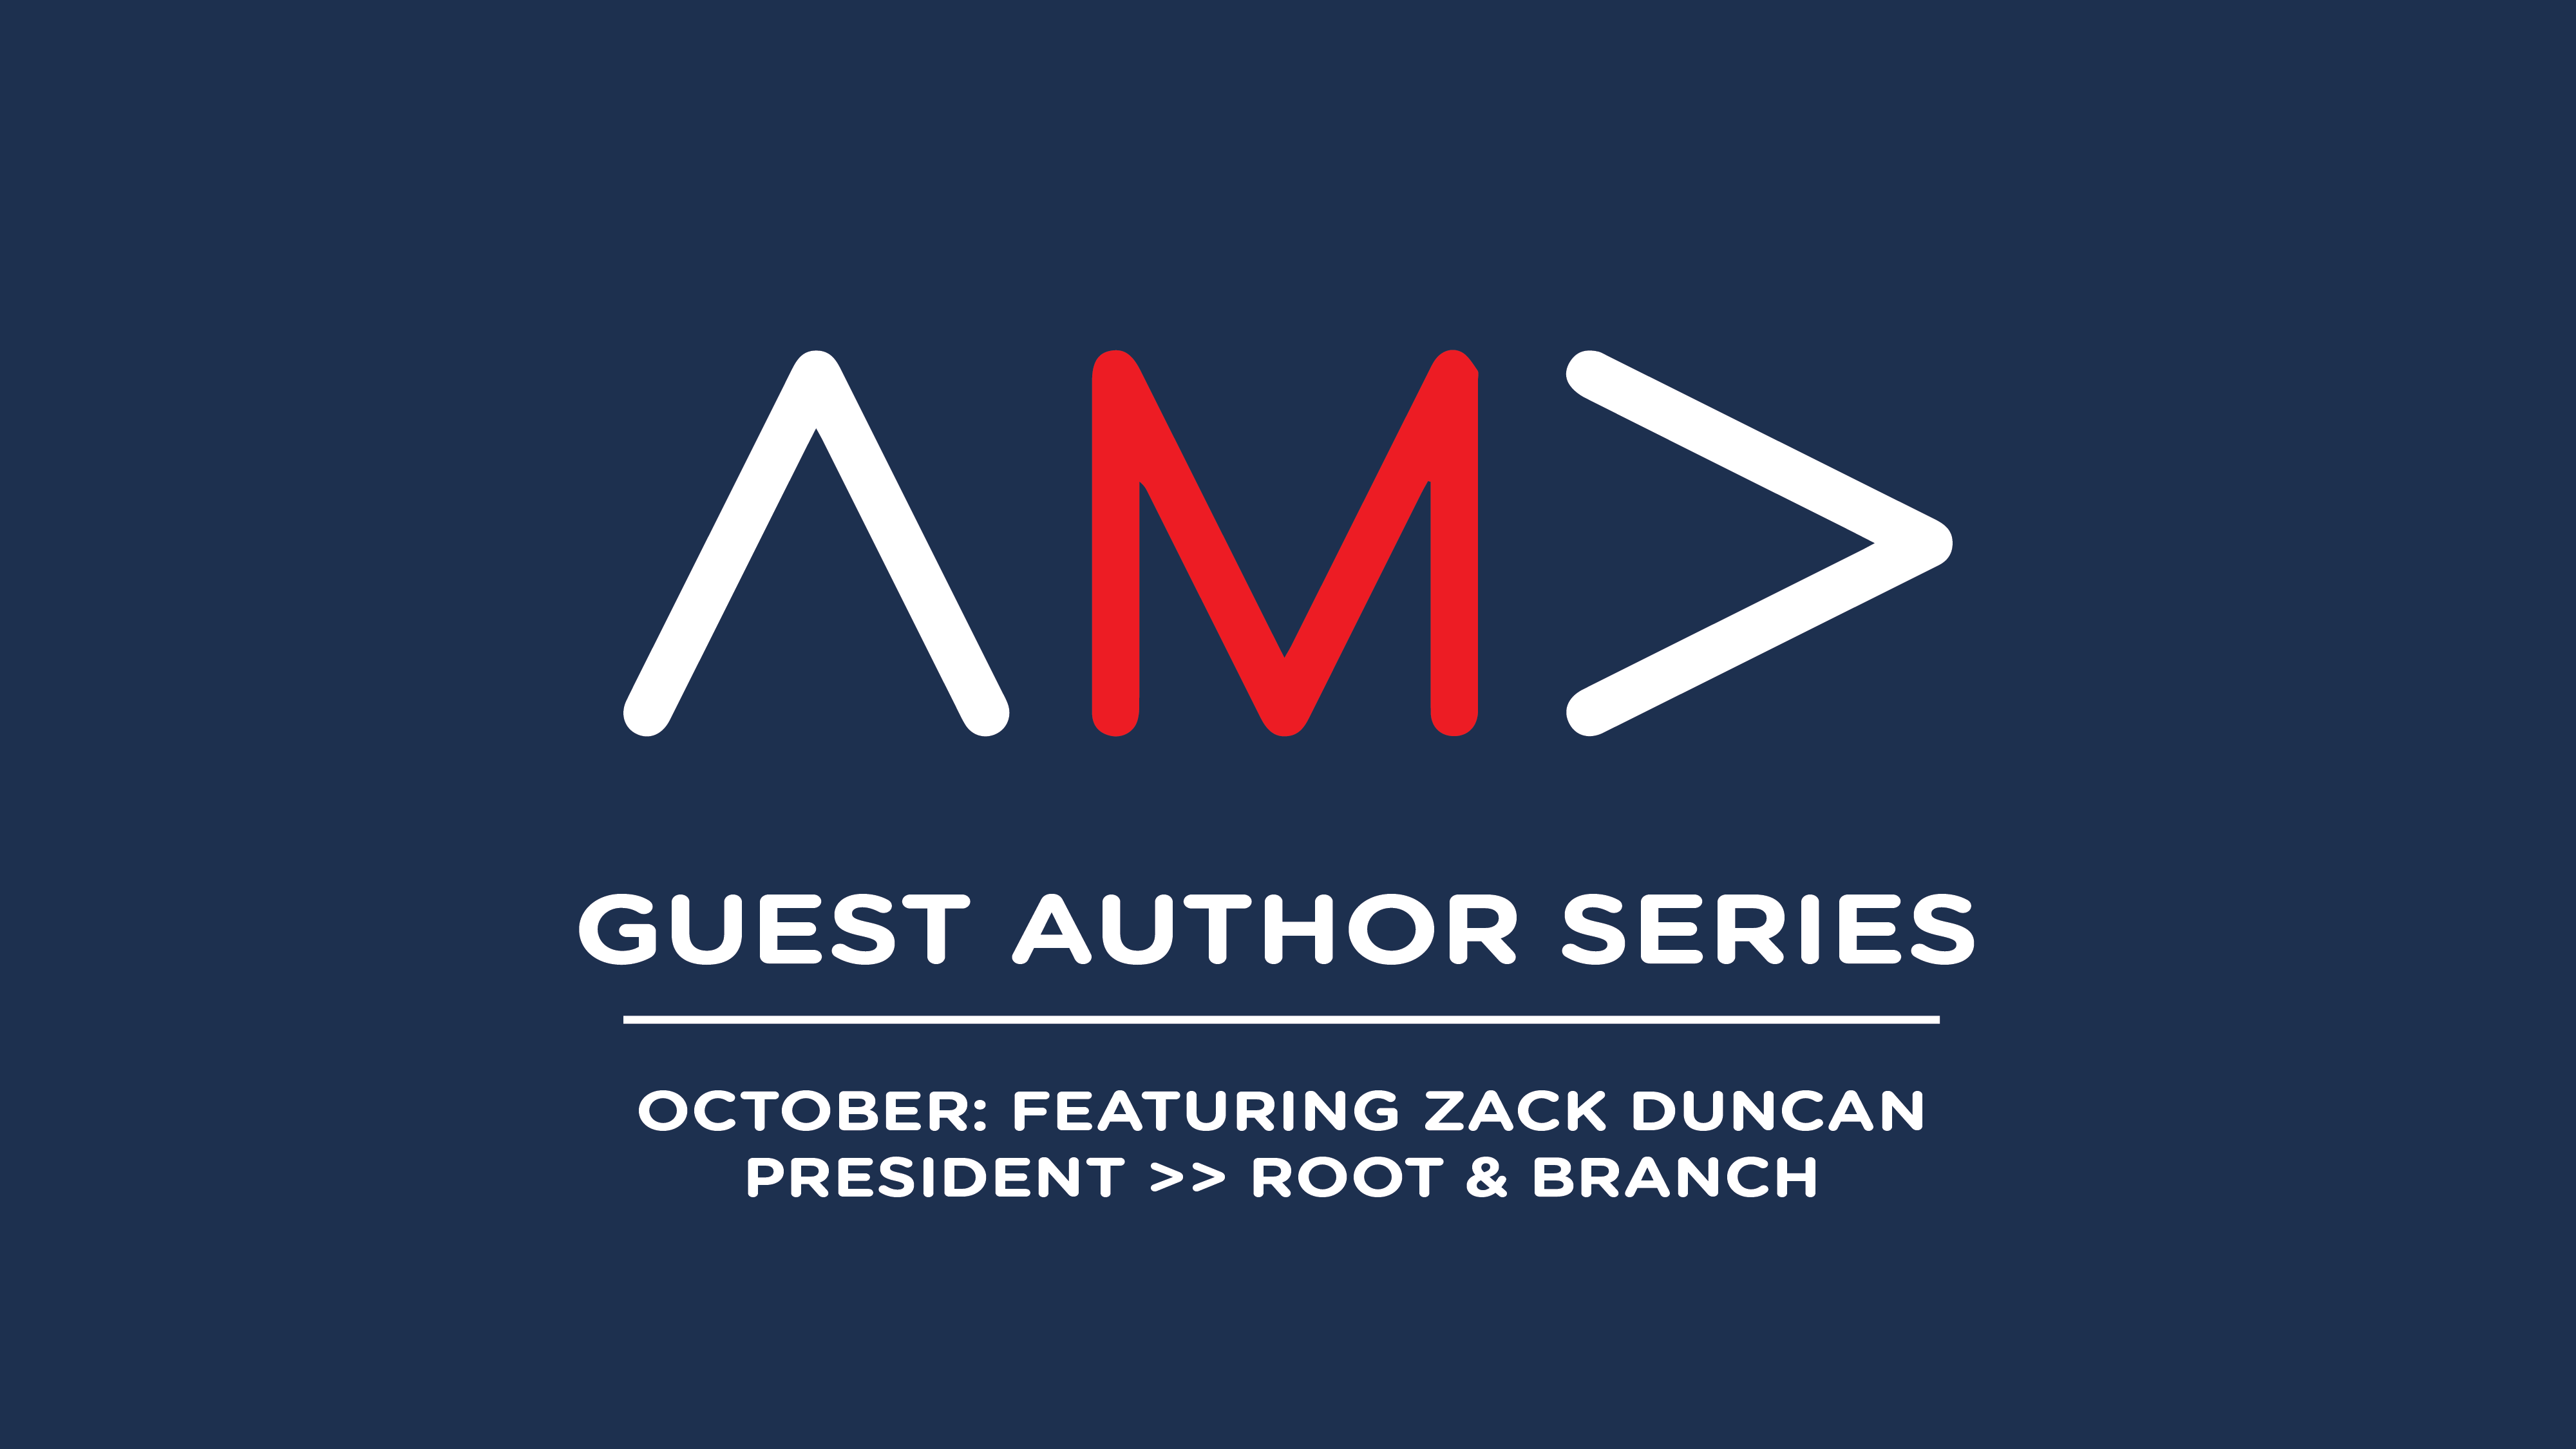 October Guest Author Zack Duncan of Root & Branch